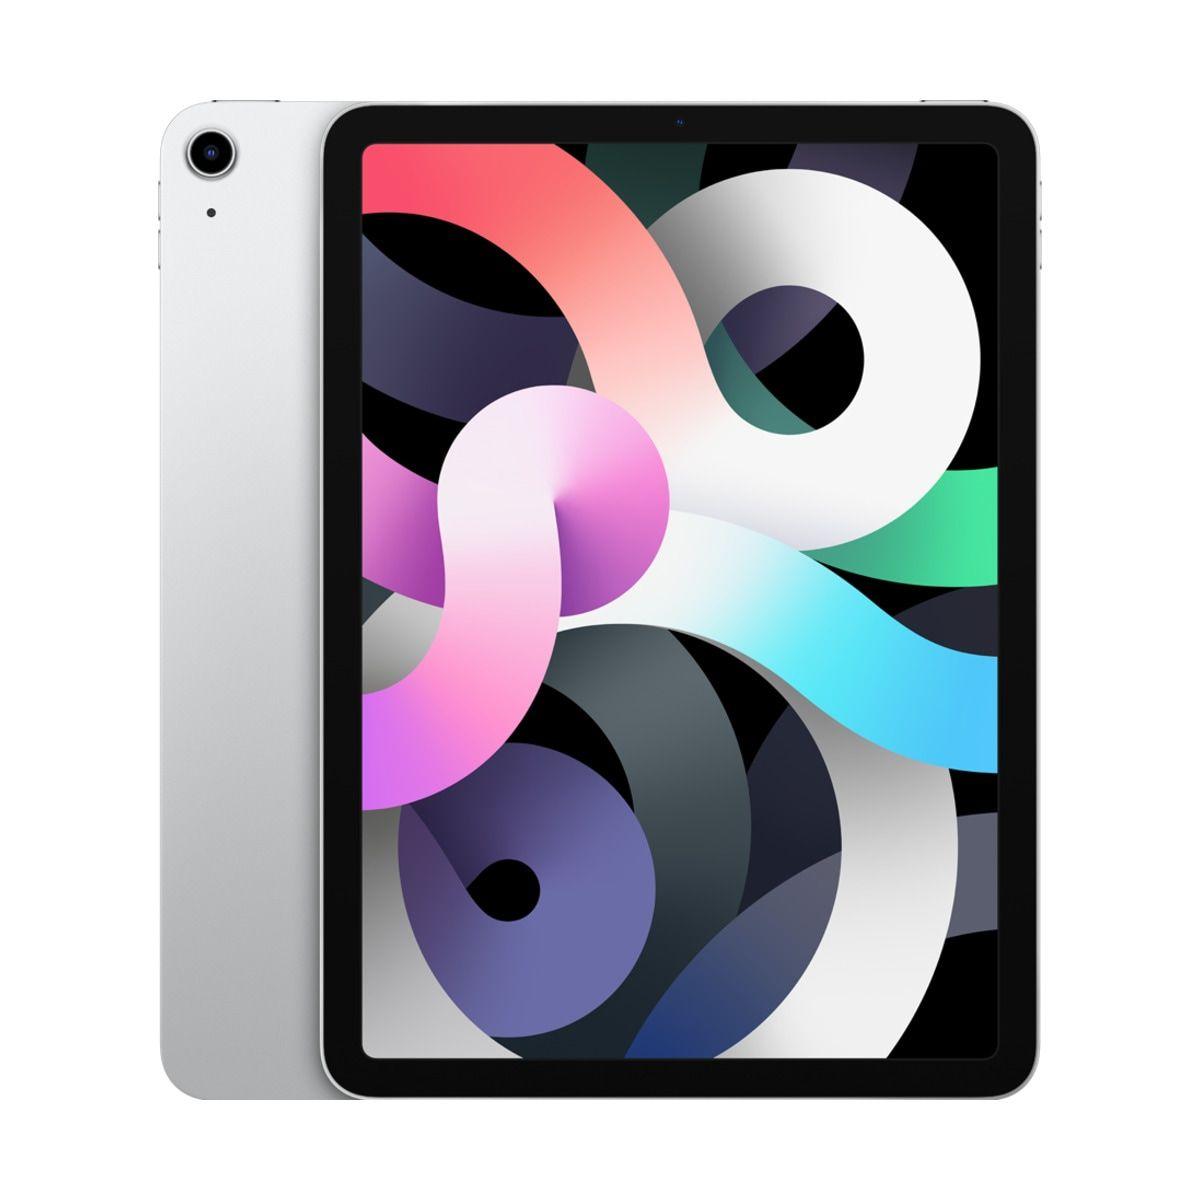 Apple iPad Air Wi-Fi 256GB - Silver